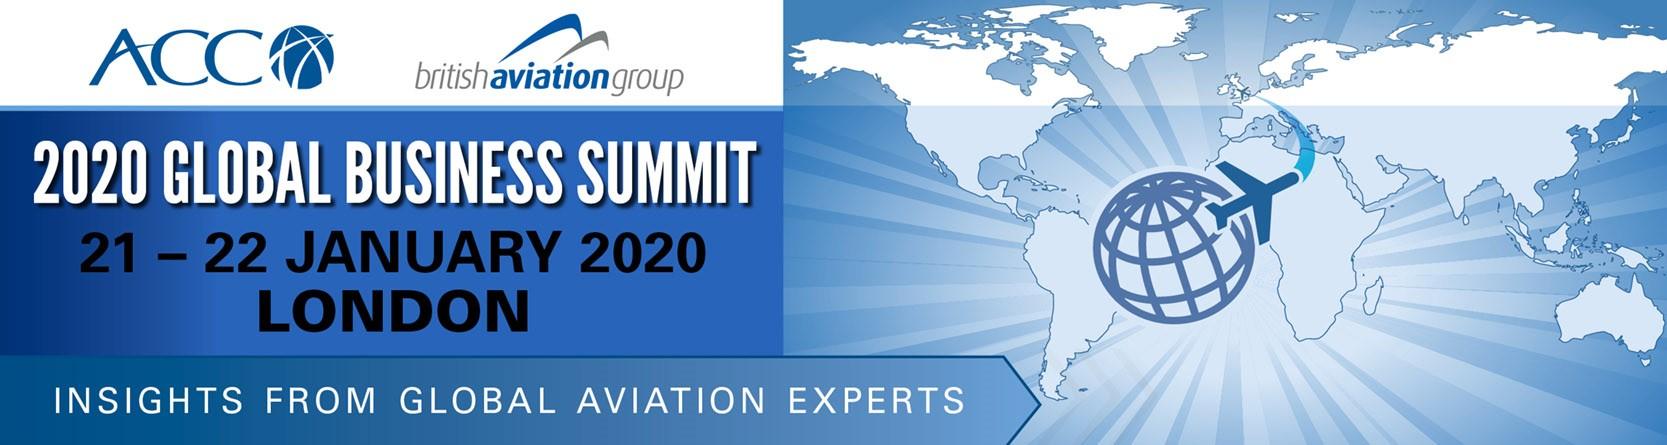 BAG ACC Global Business Summit 2020